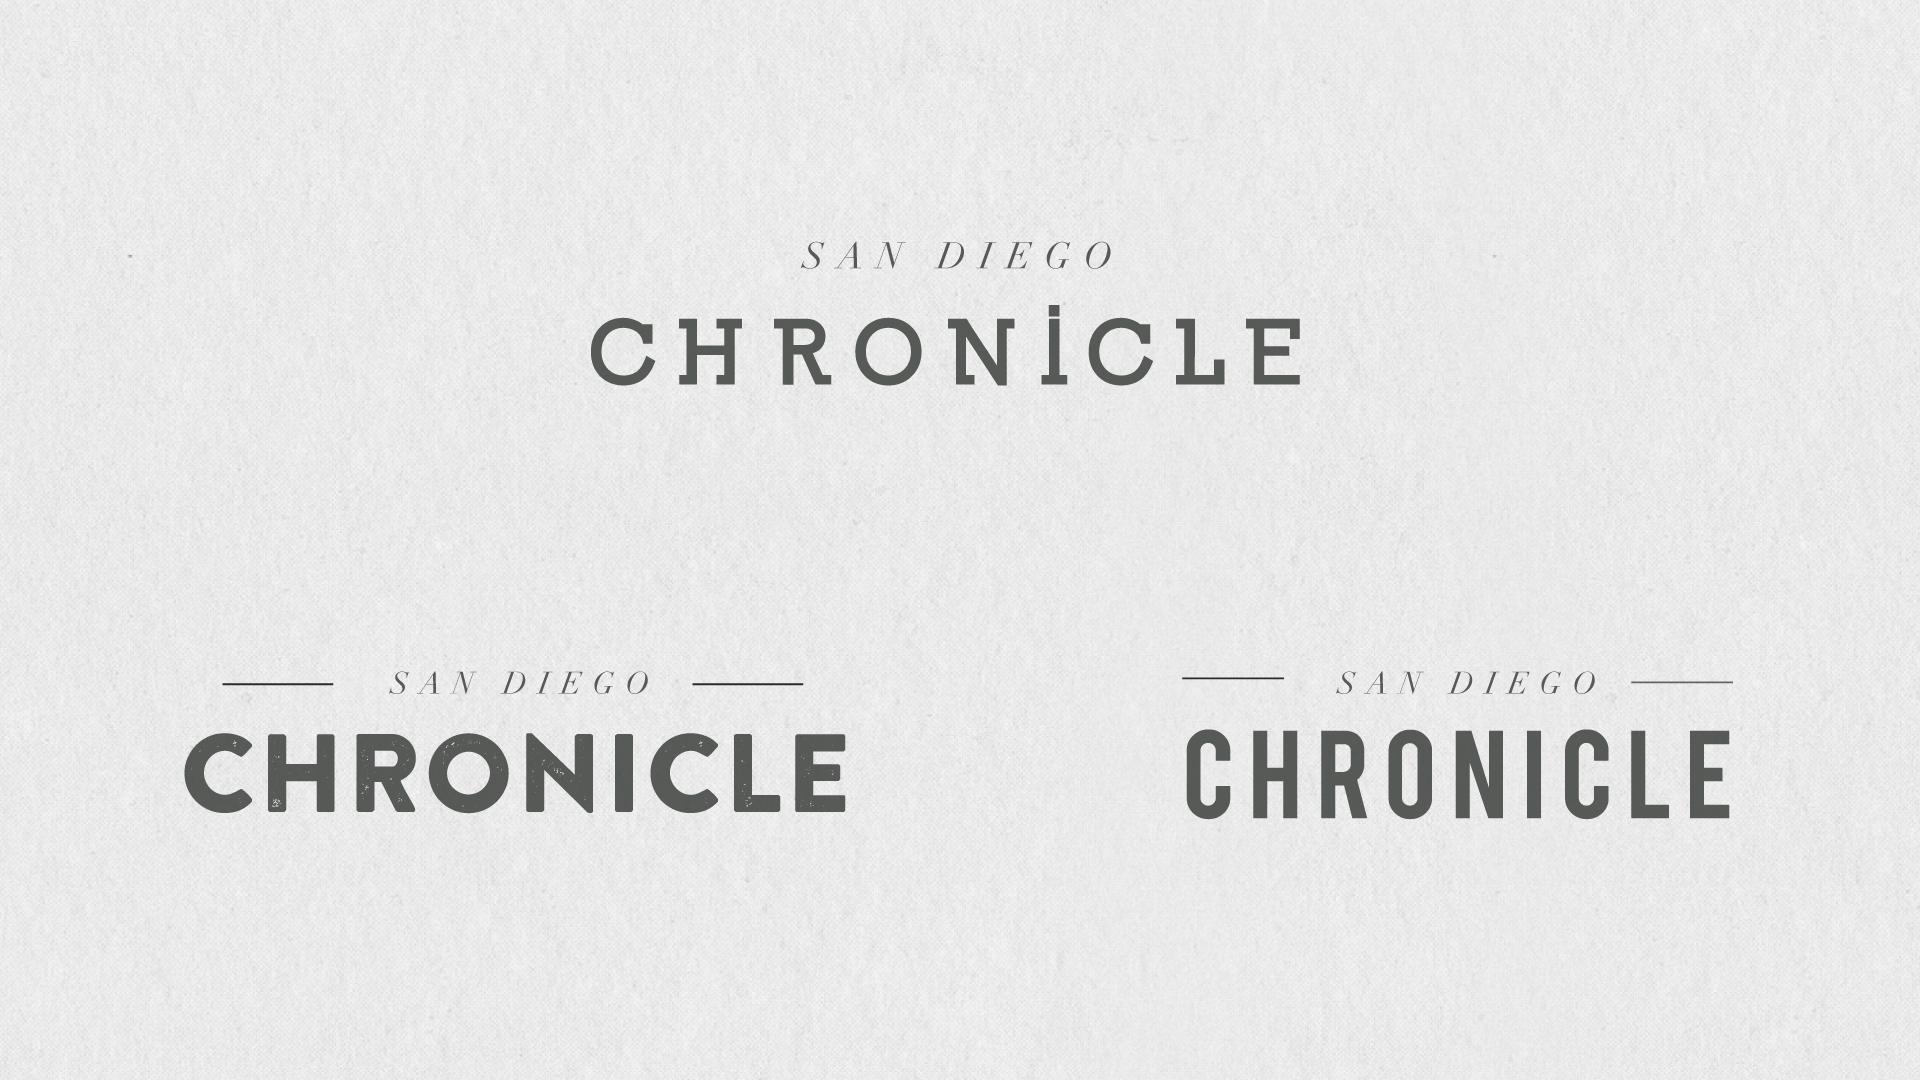 sd-chronical-logos.concept2.png